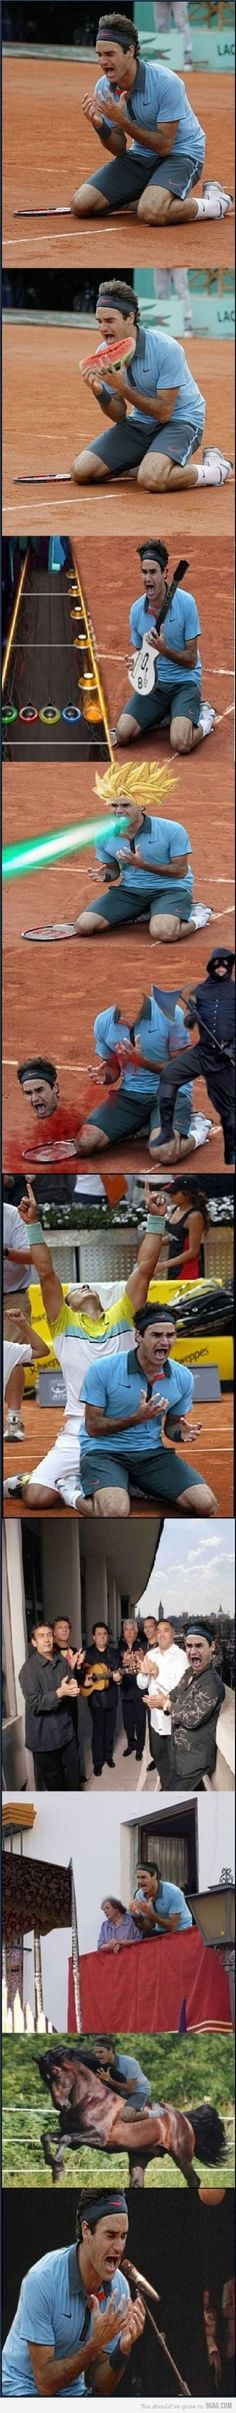 Roger Federer Trolling